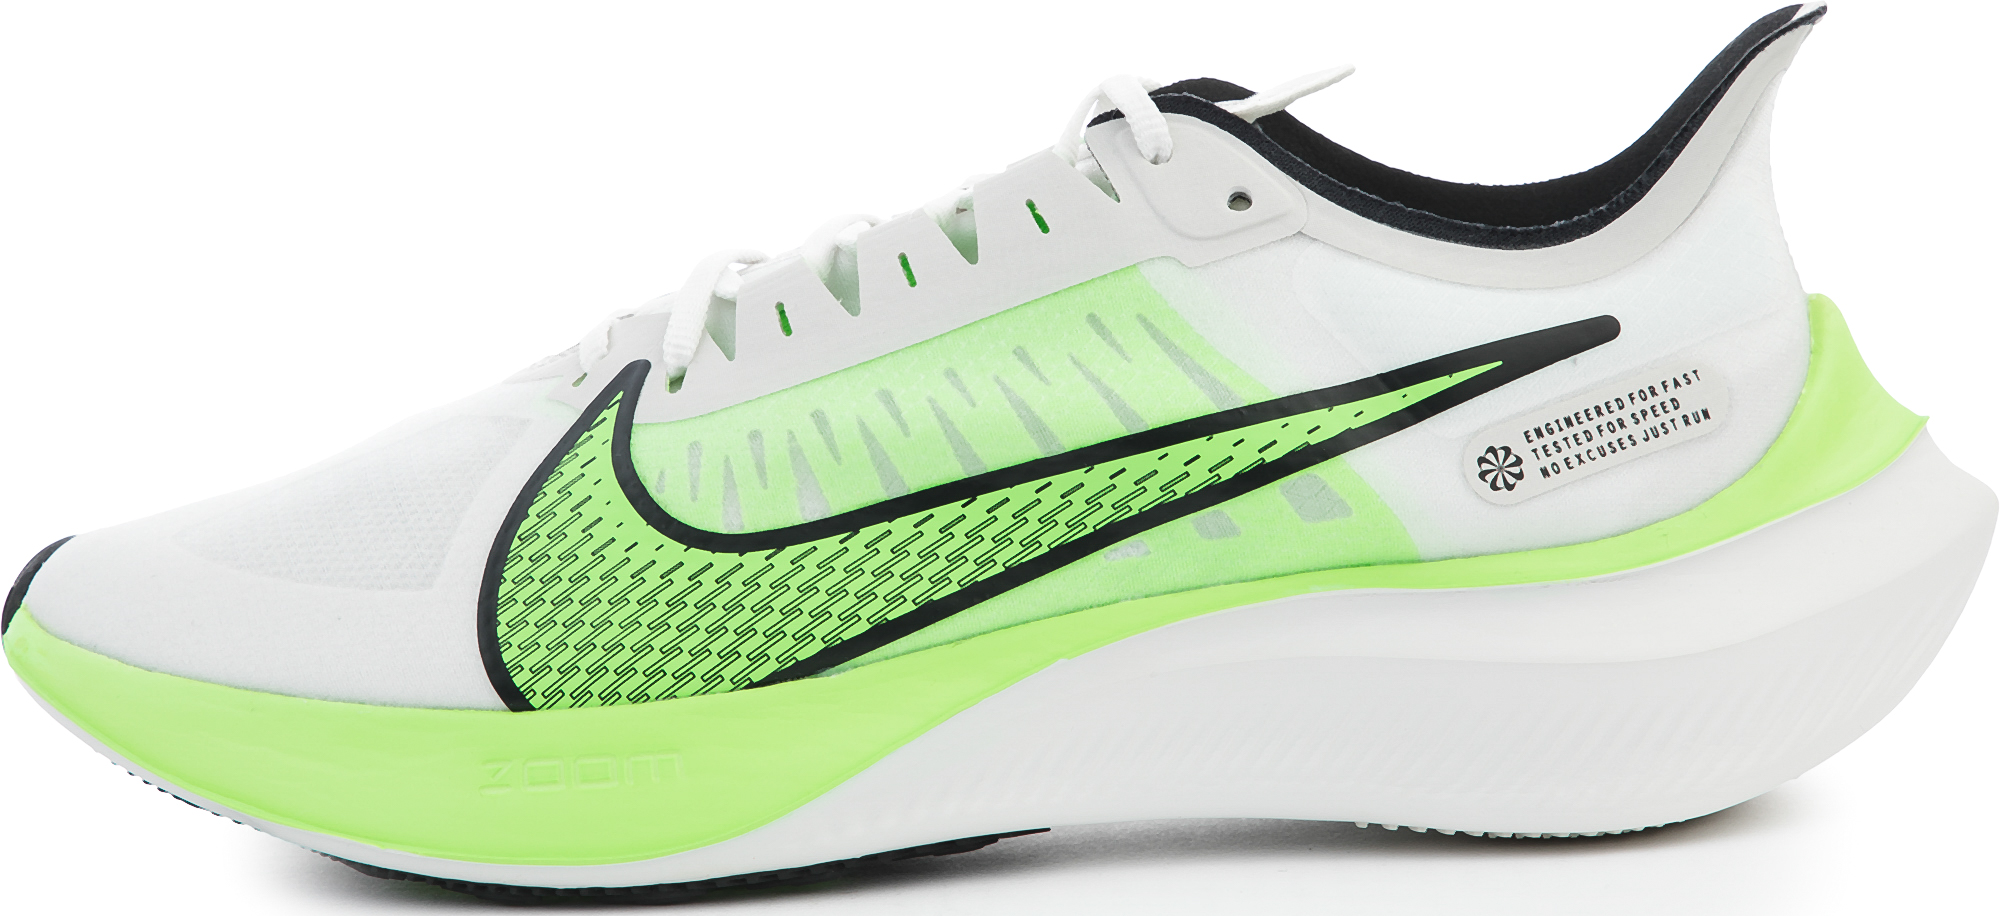 Nike Кроссовки мужские Nike Zoom Gravity, размер 46,5 стоимость